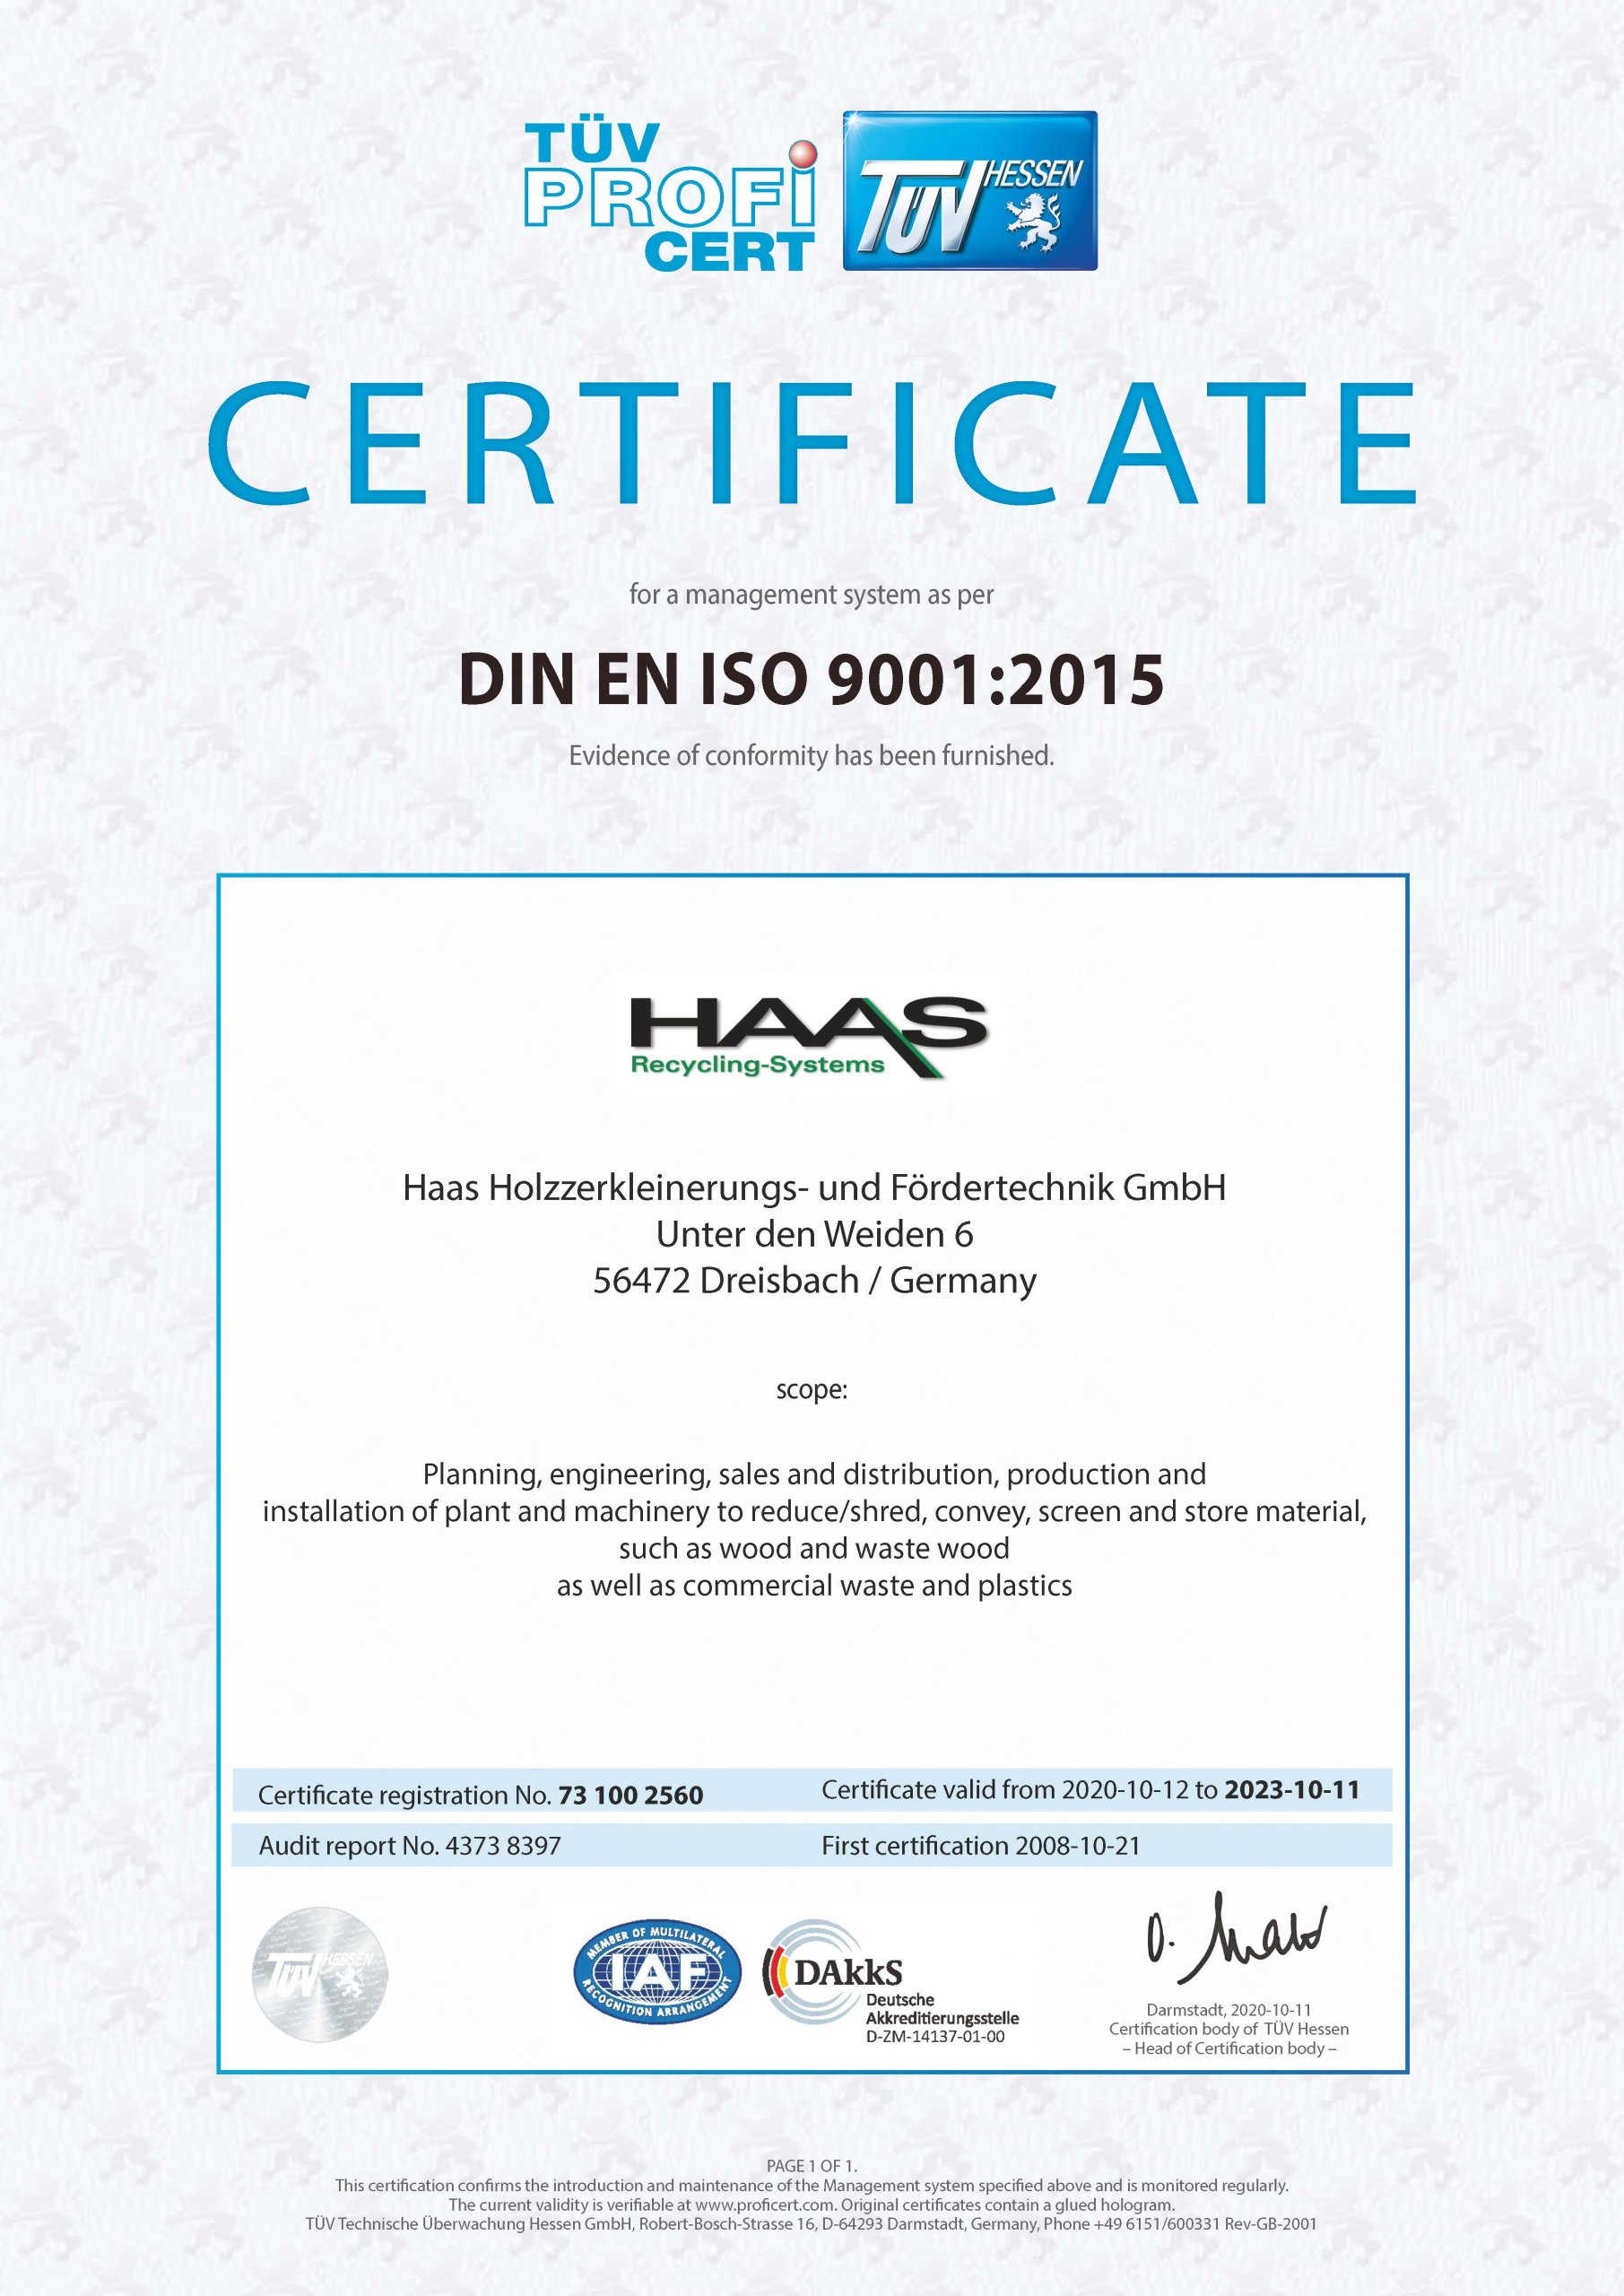 Technical Control Board (TÜV) Certificate Hessen 2008